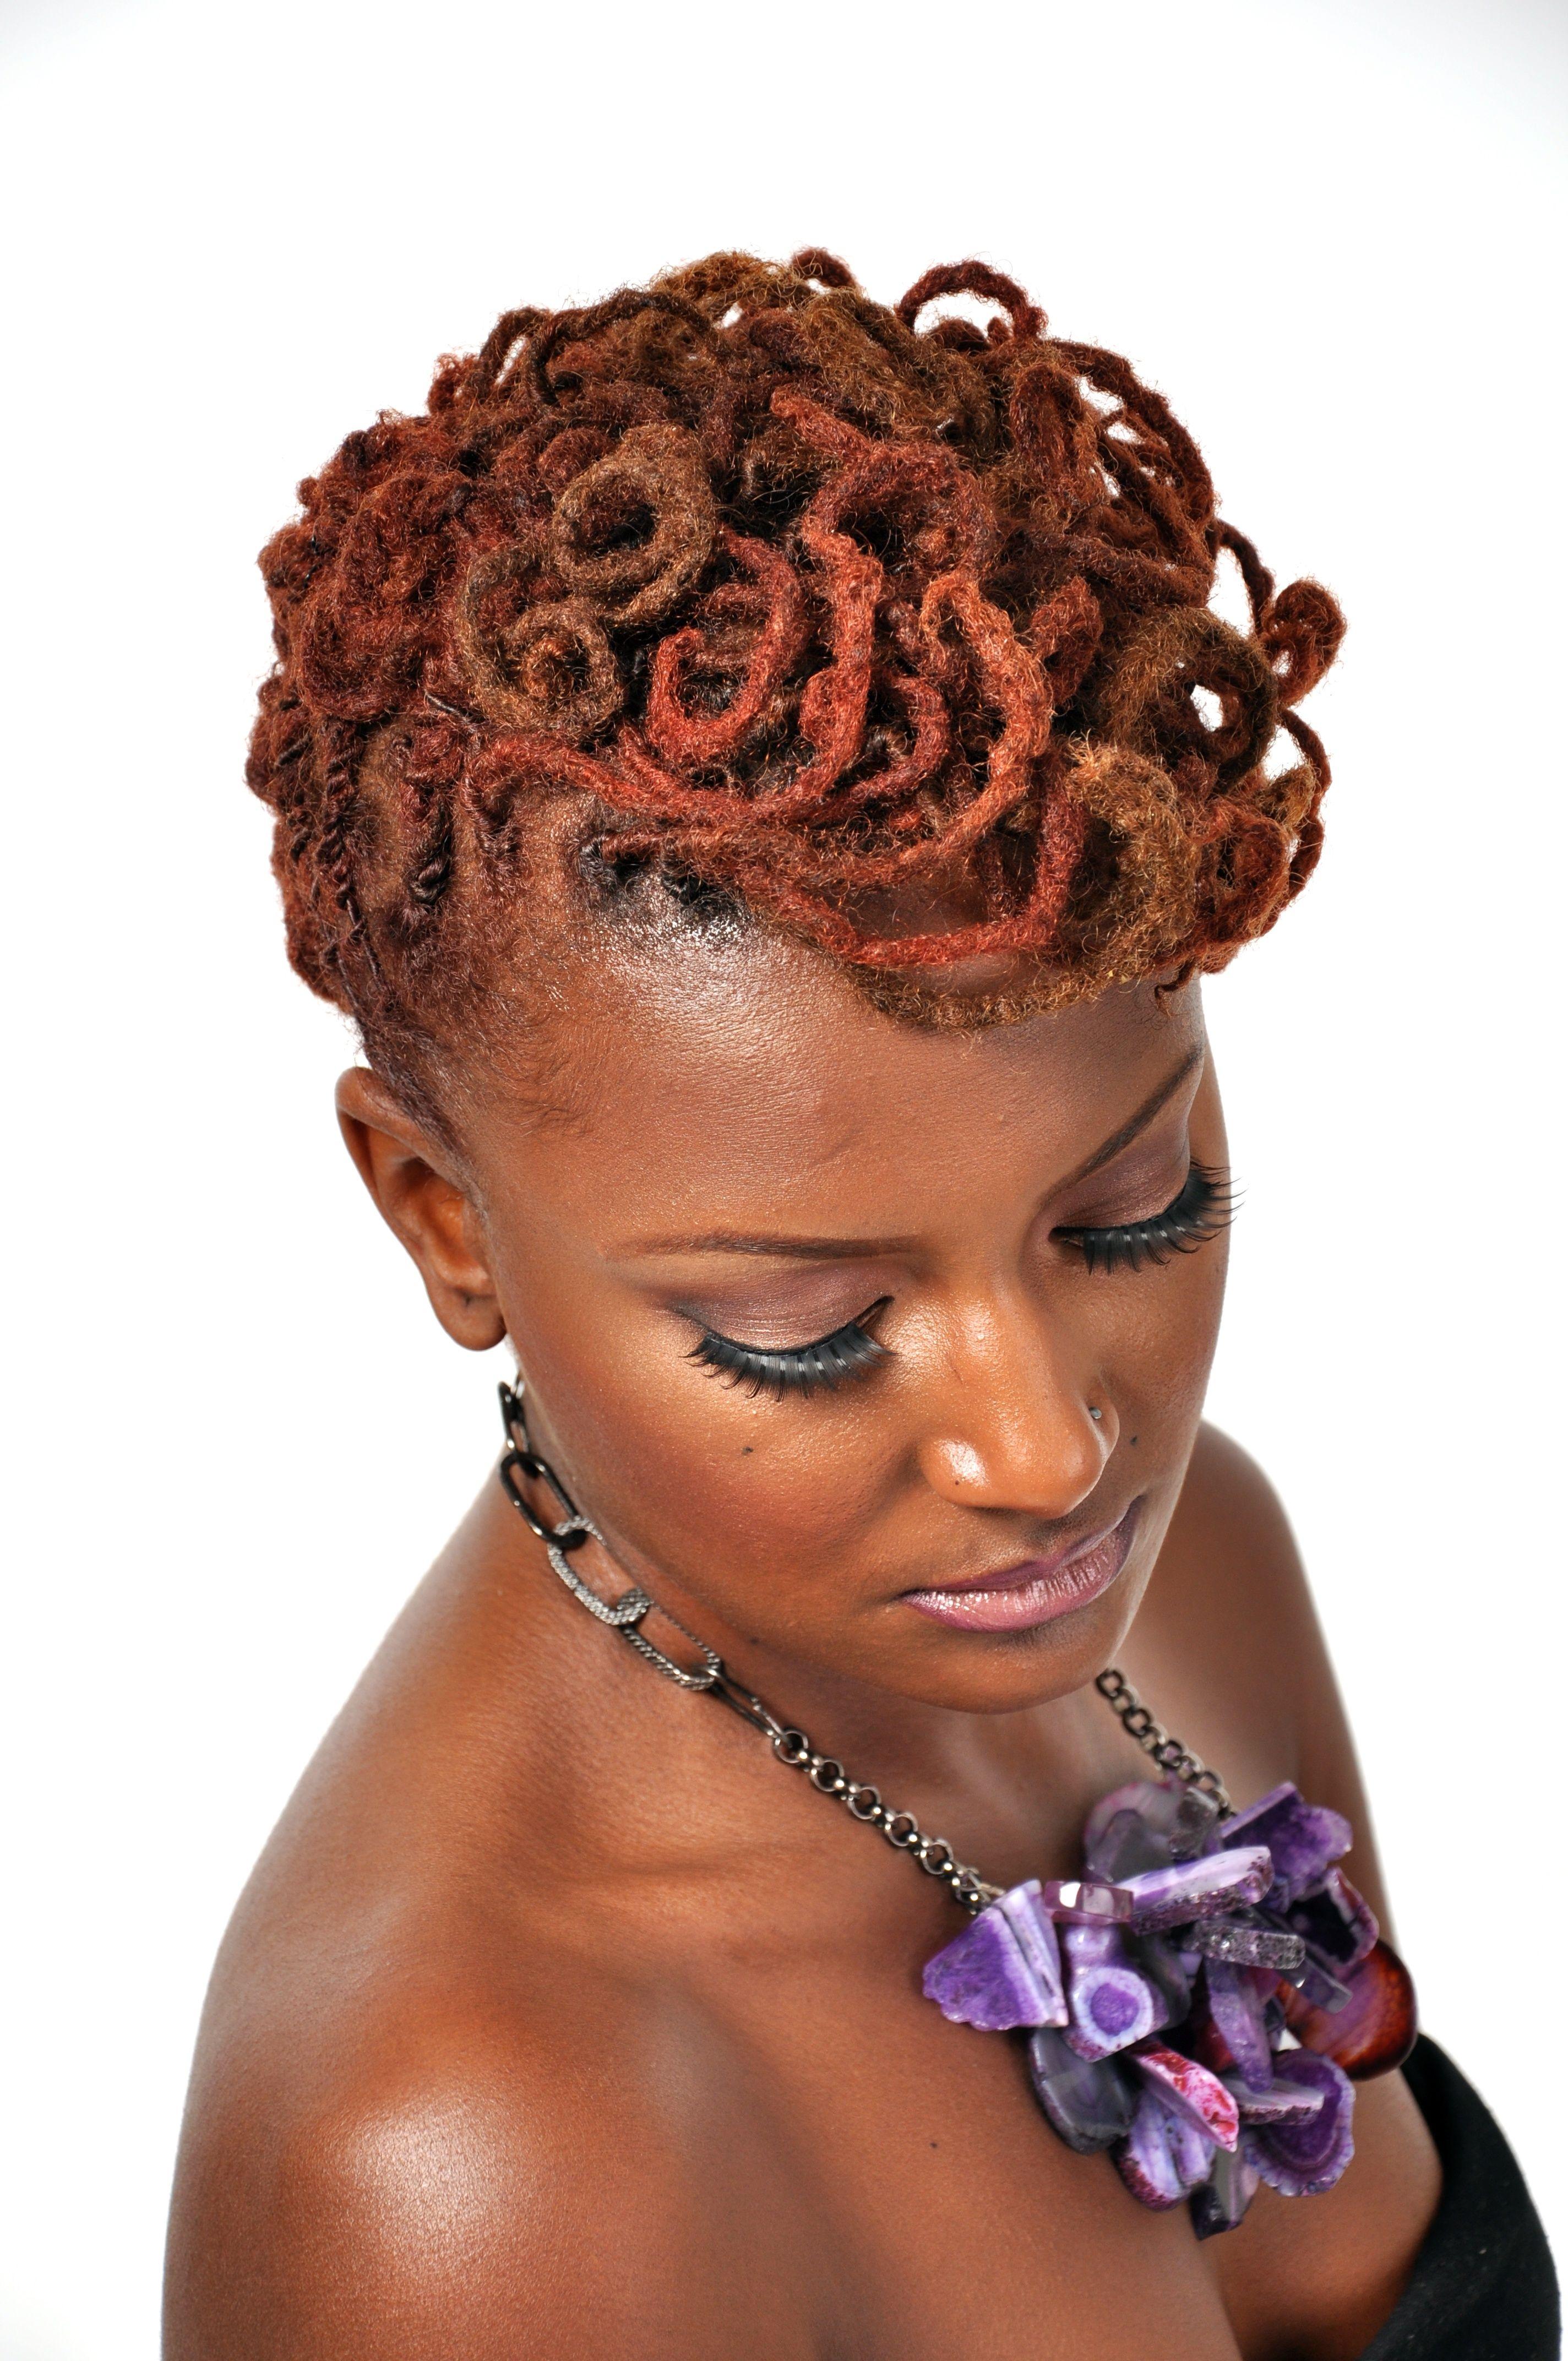 Natural Hairstyles For Black Women Dreadlocks ...  |Dread Hairstyles Black Natural